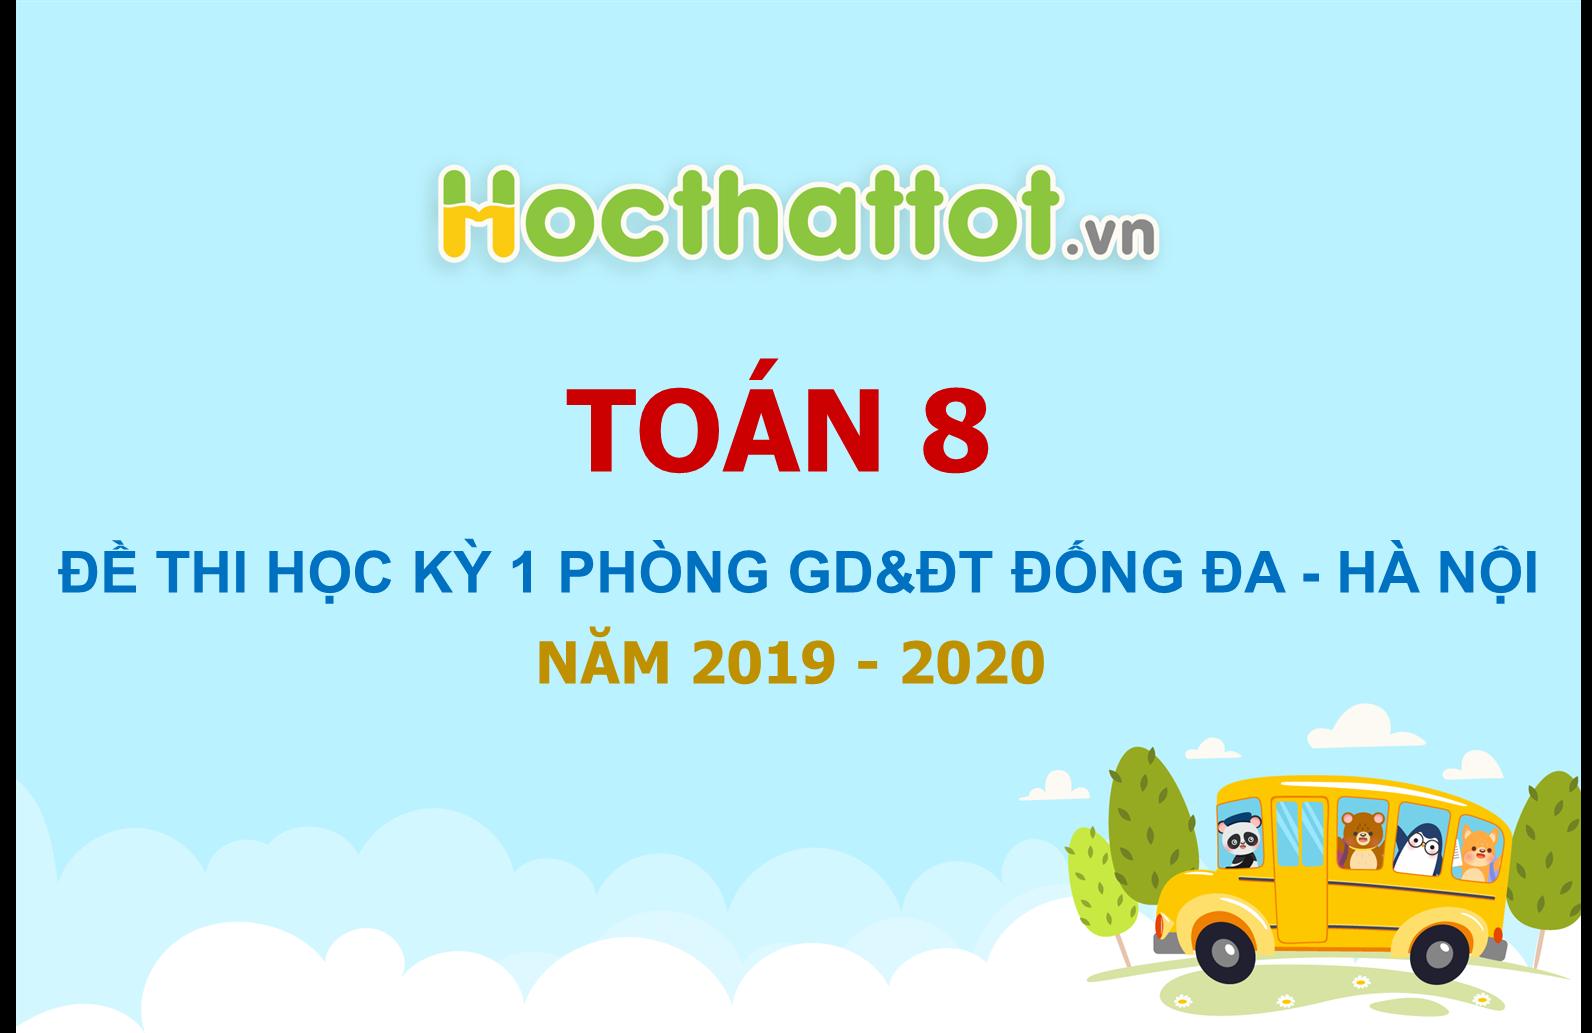 de-thi-hoc-ky-1-toan-8-nam-2019-2020-phong-gddt-dong-da-ha-noi